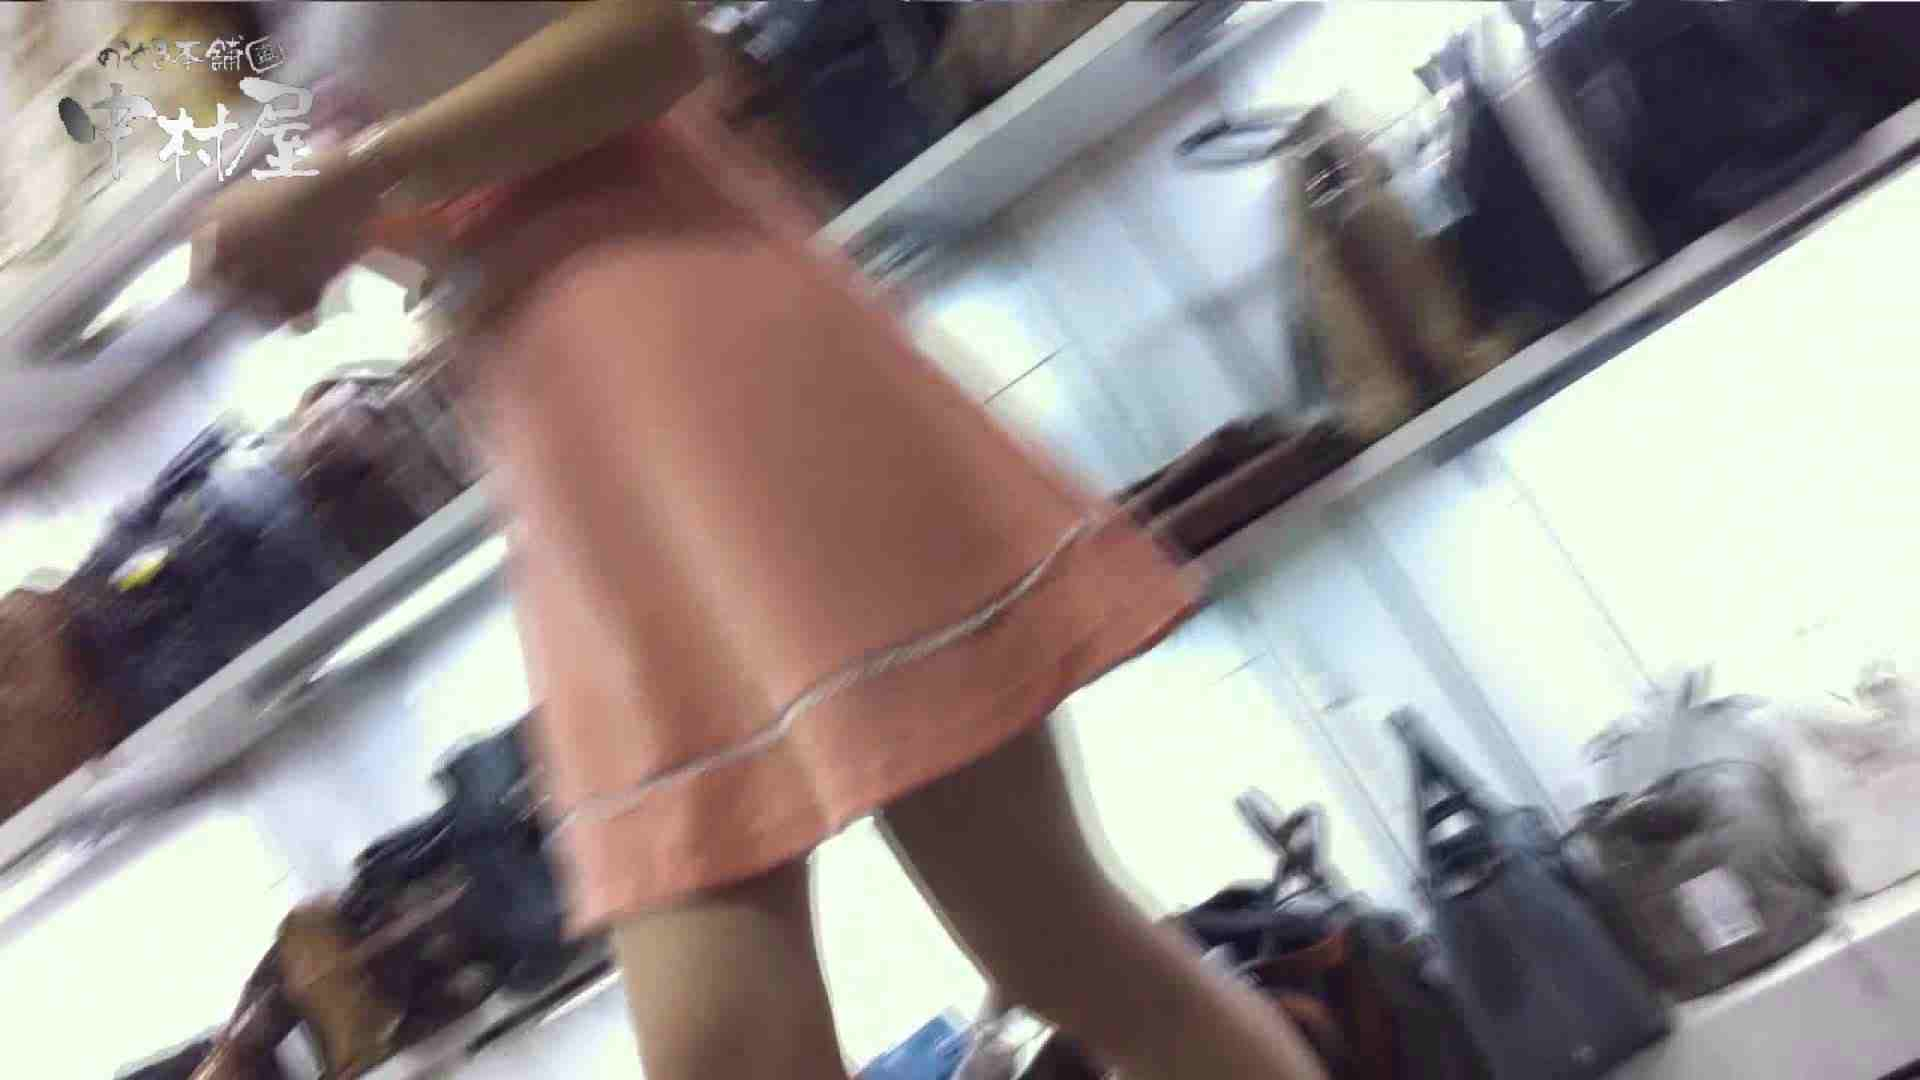 vol.44 可愛いカリスマ店員限定‼胸チラ&パンチラ はみパンねぇさん! 胸チラ  104pic 30